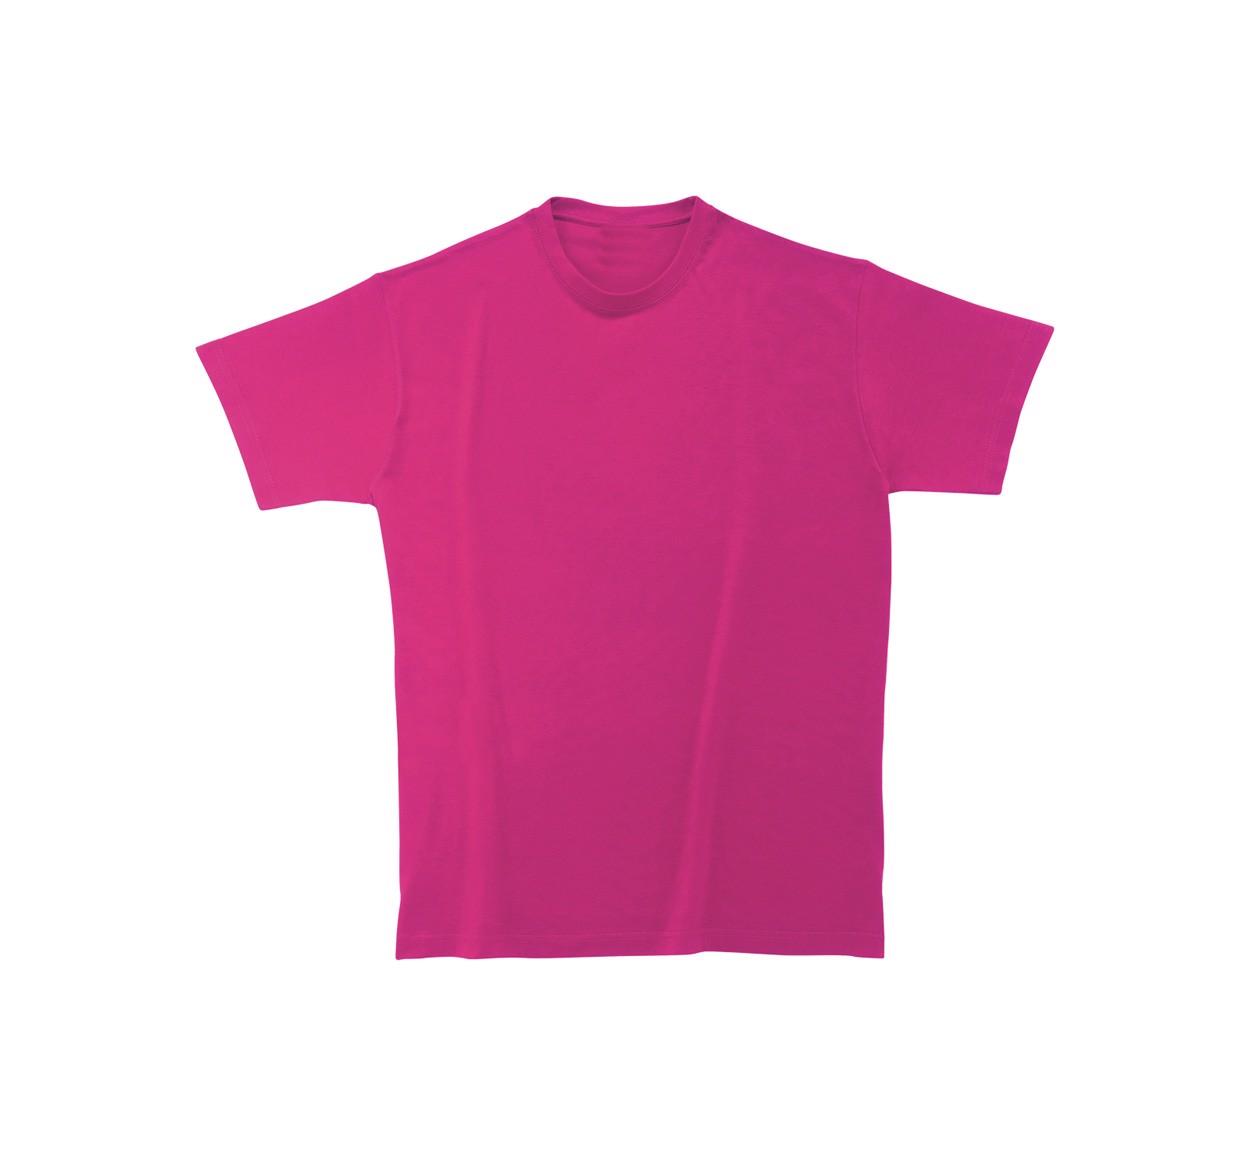 Tričko Heavy Cotton - Růžová / S